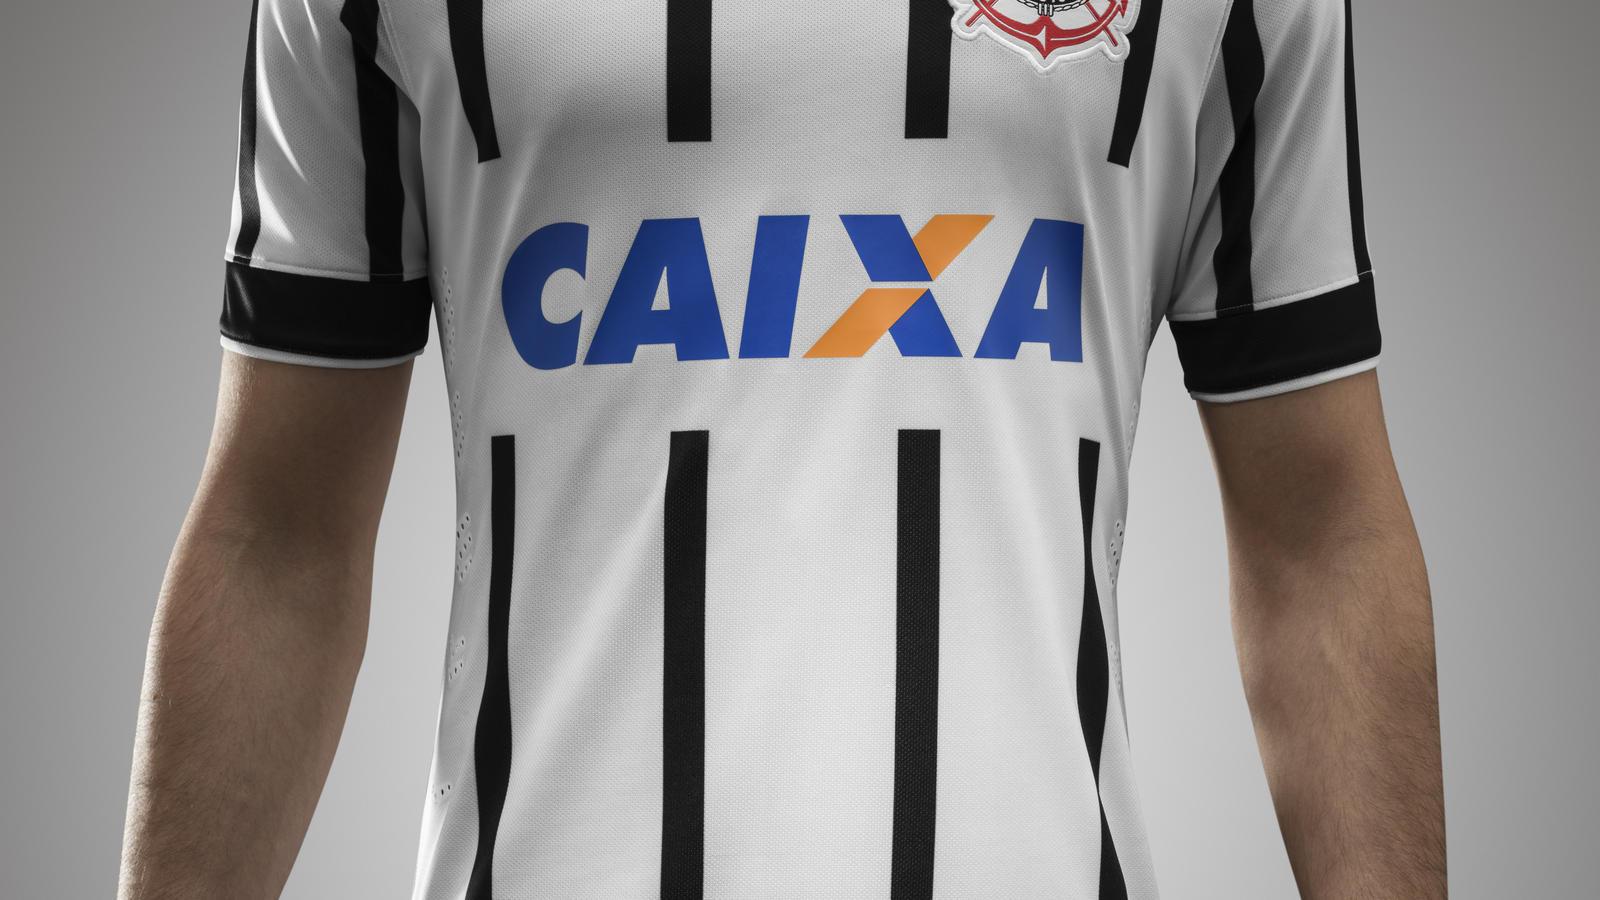 e541ed3de46be Fa14 Fb Brasil Corinthians Home Hero 196.Jpeg.  fa14 fb brasil corinthians elias celebration.  fa14 fb brasil corinthians malcom celebration